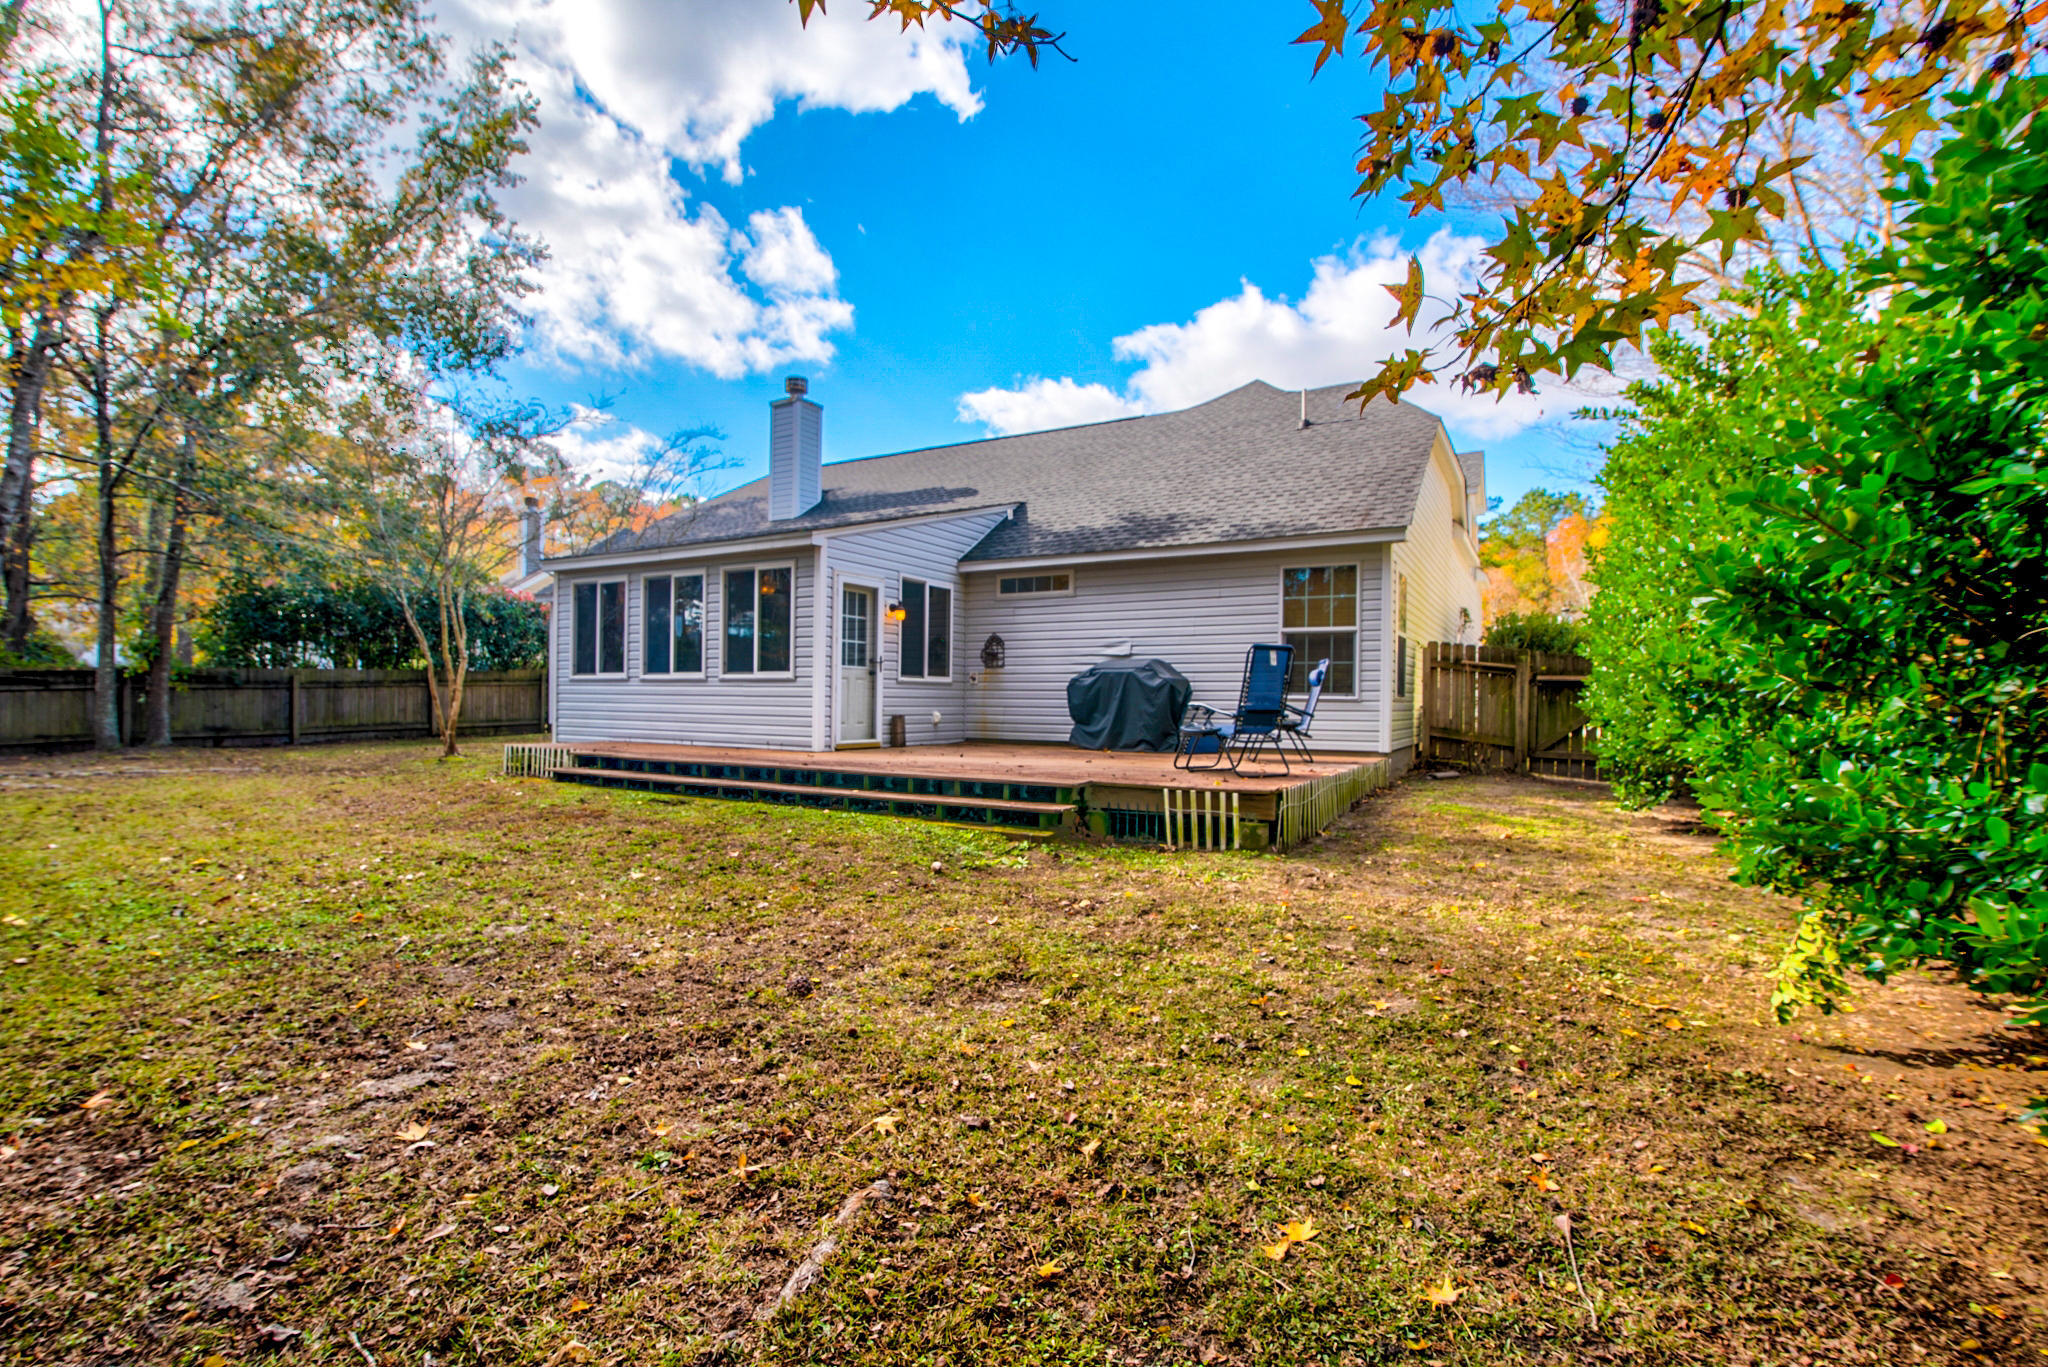 Planters Pointe Homes For Sale - 3382 Lindner, Mount Pleasant, SC - 19